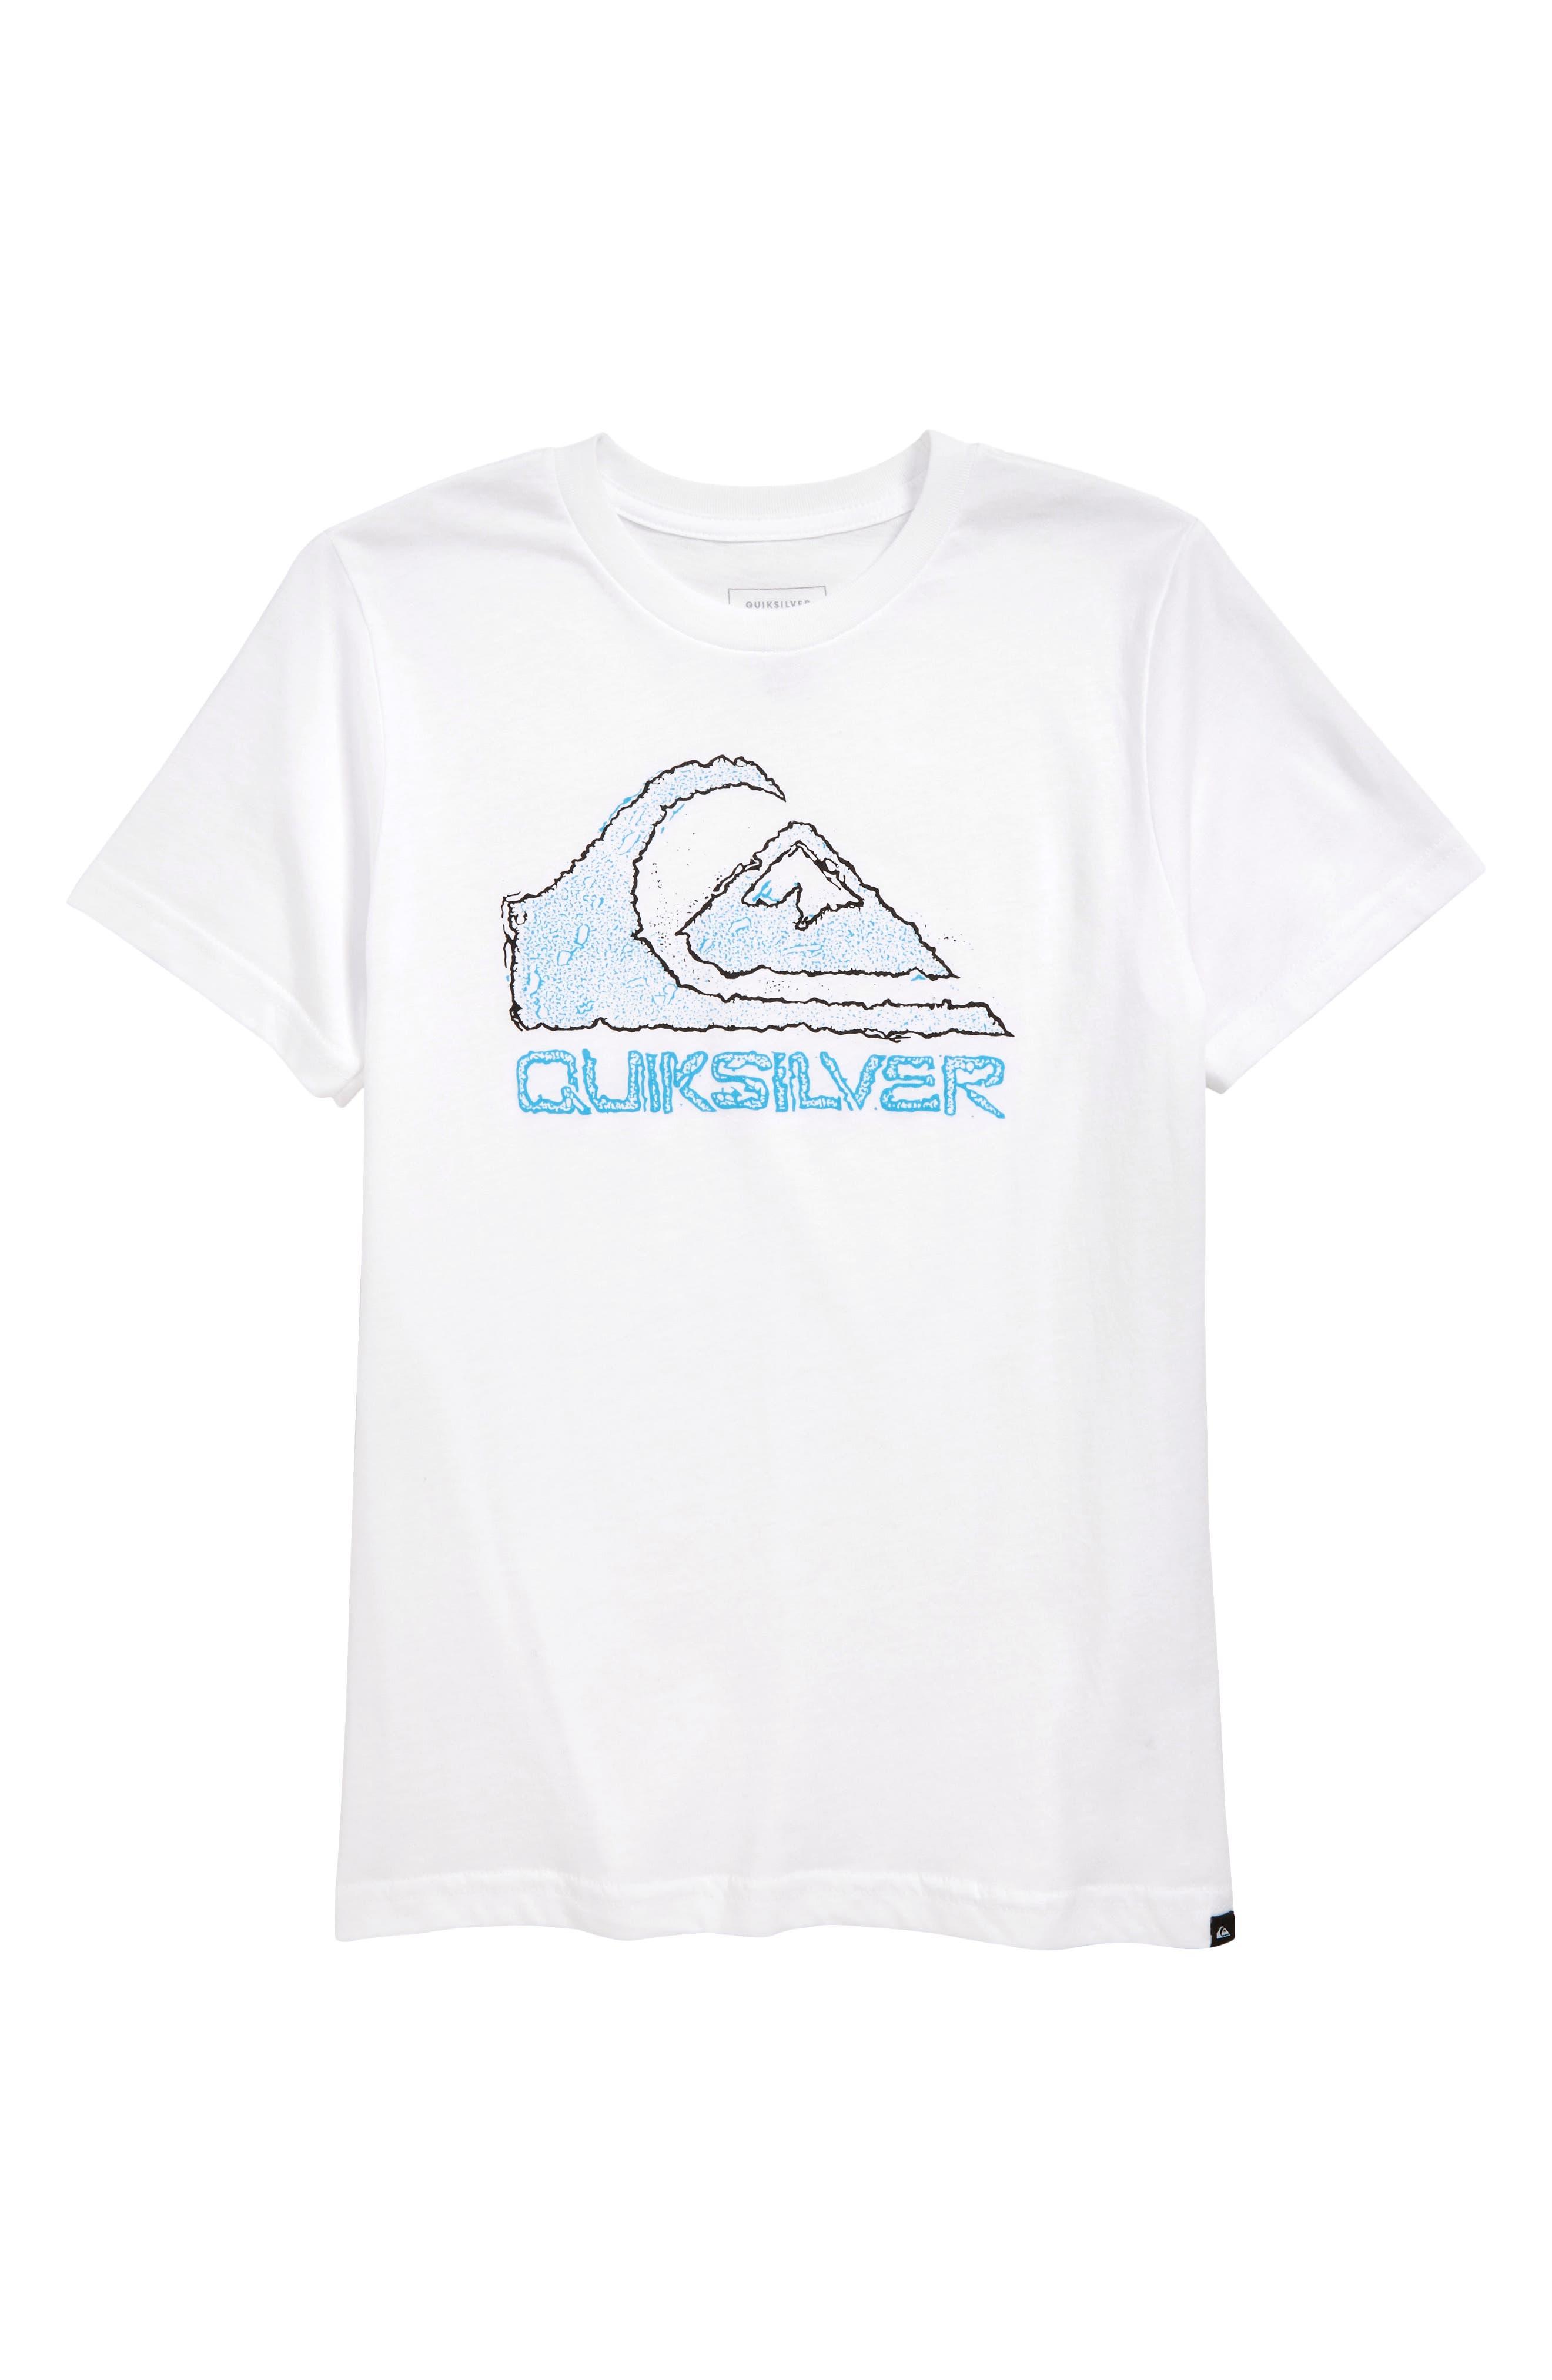 QUIKSILVER, Turbo Boost T-Shirt, Main thumbnail 1, color, WHITE